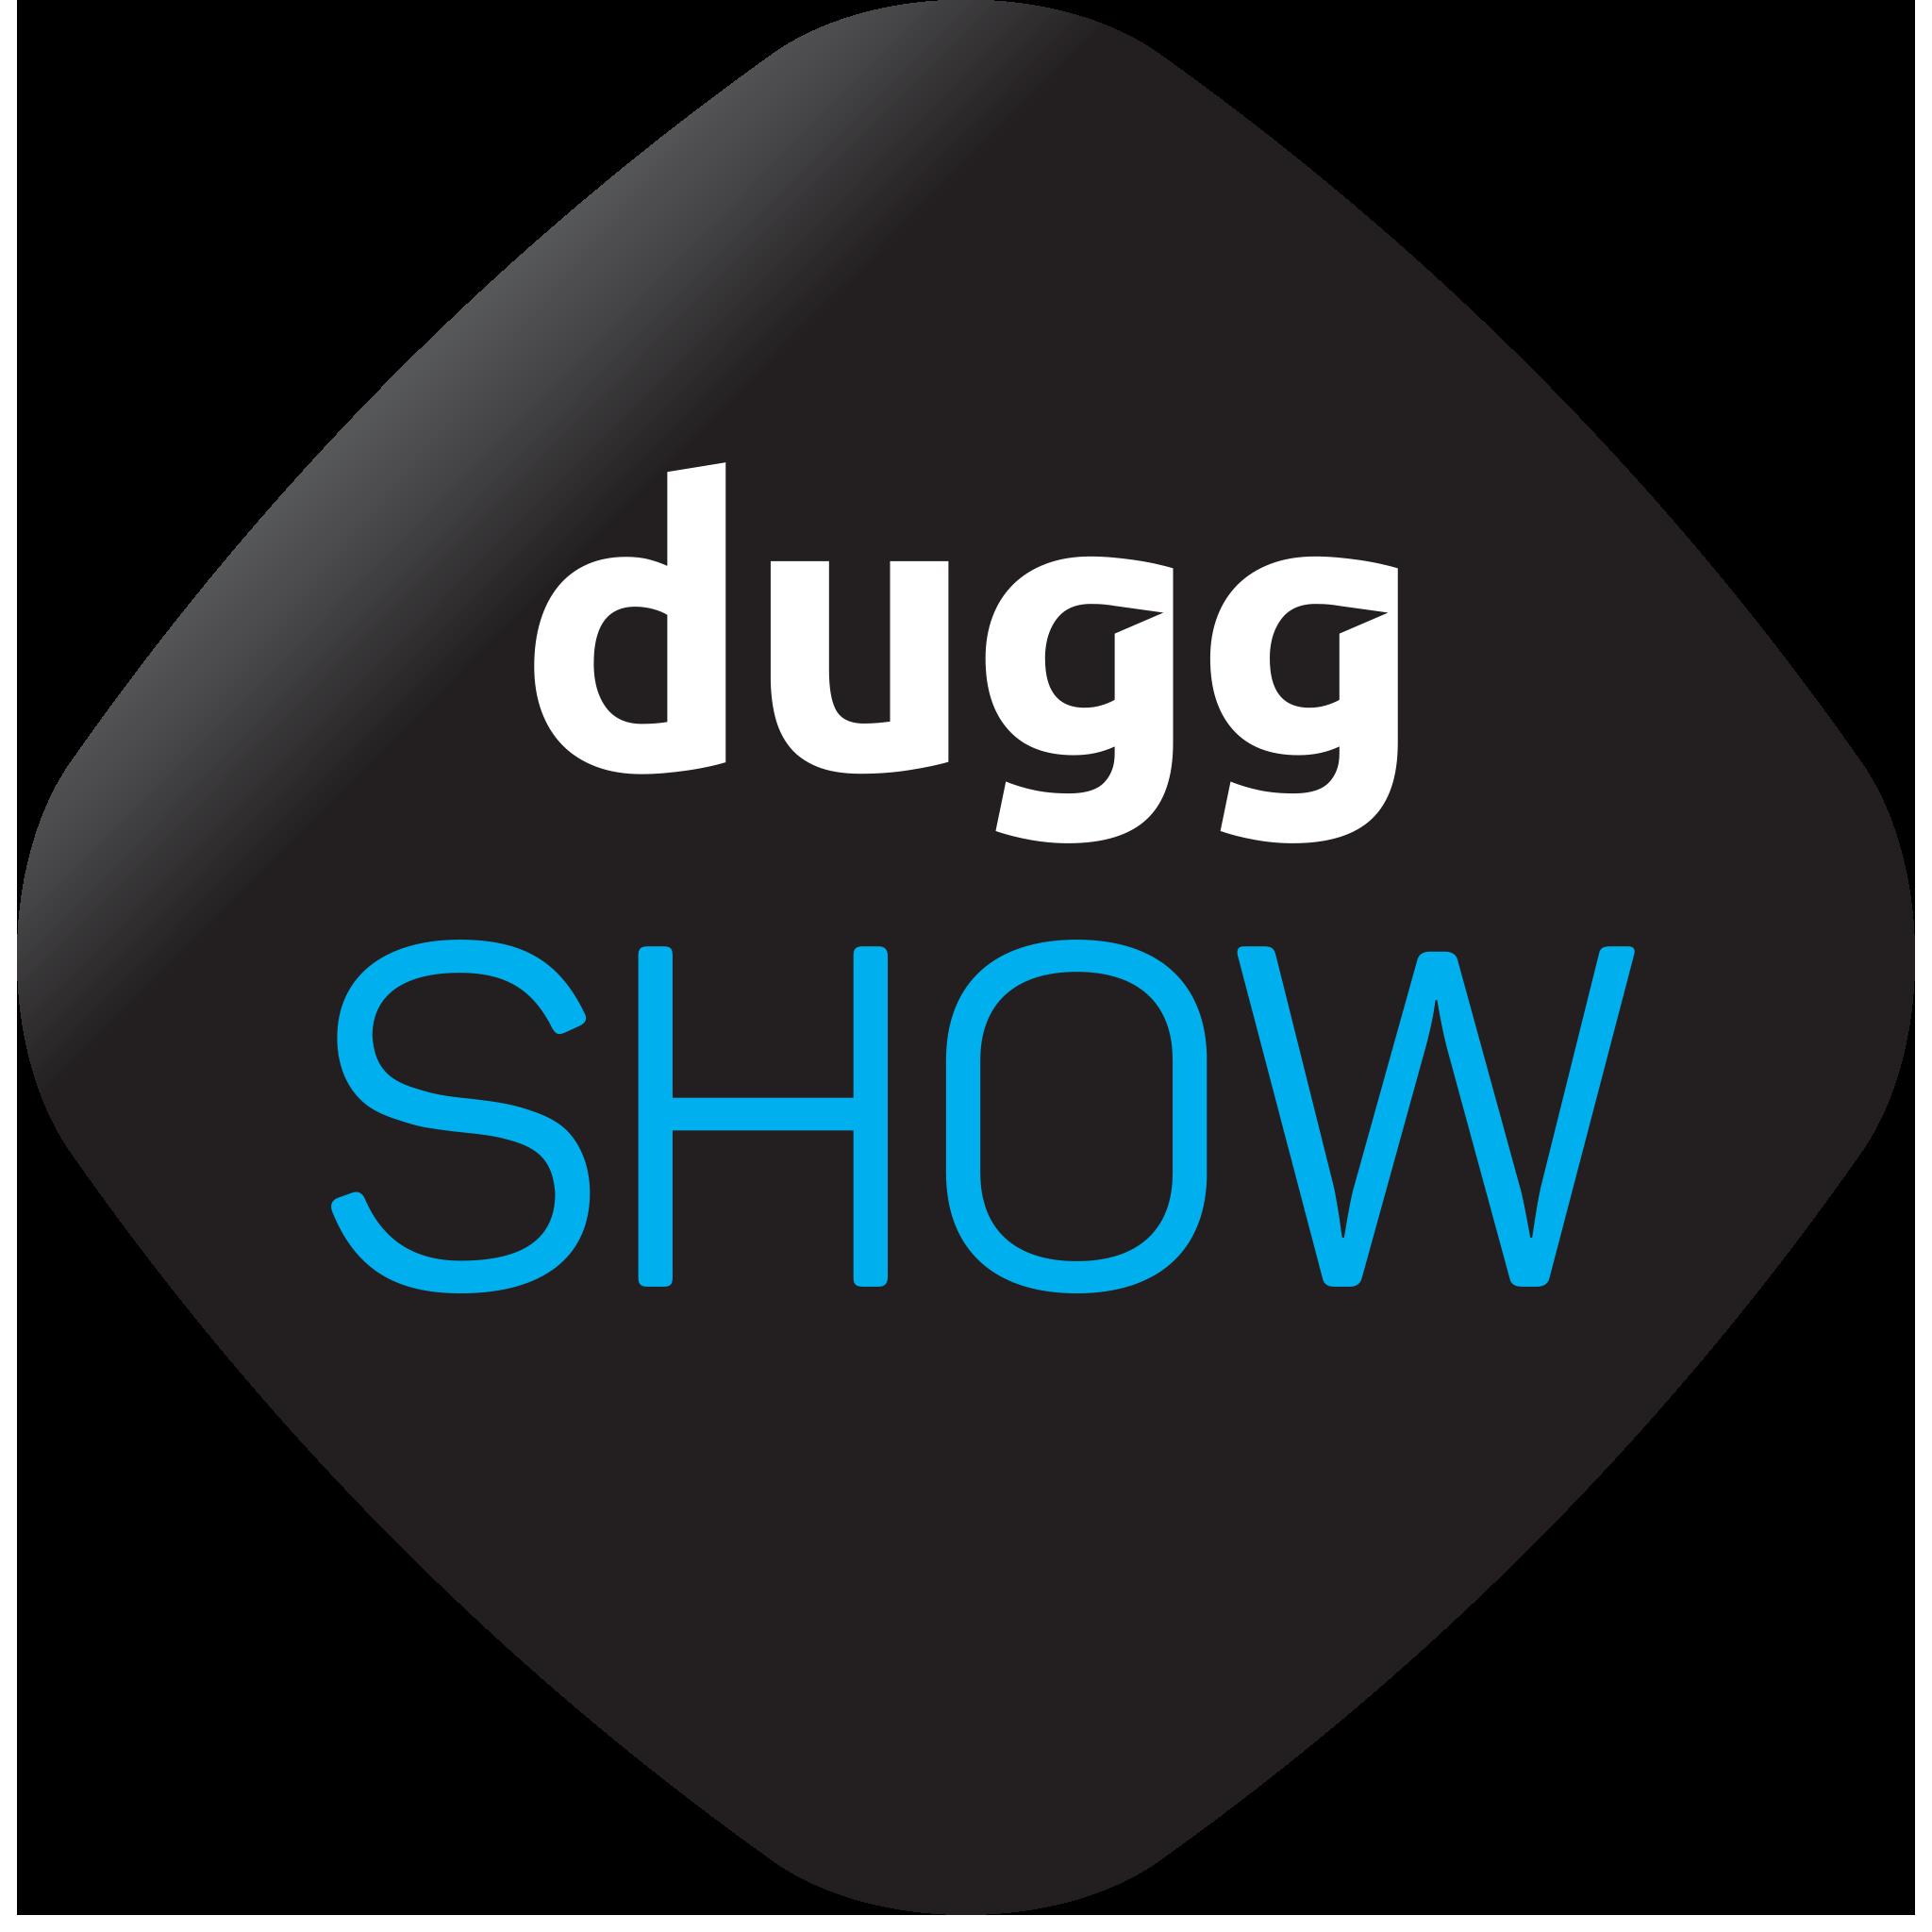 DuggShow